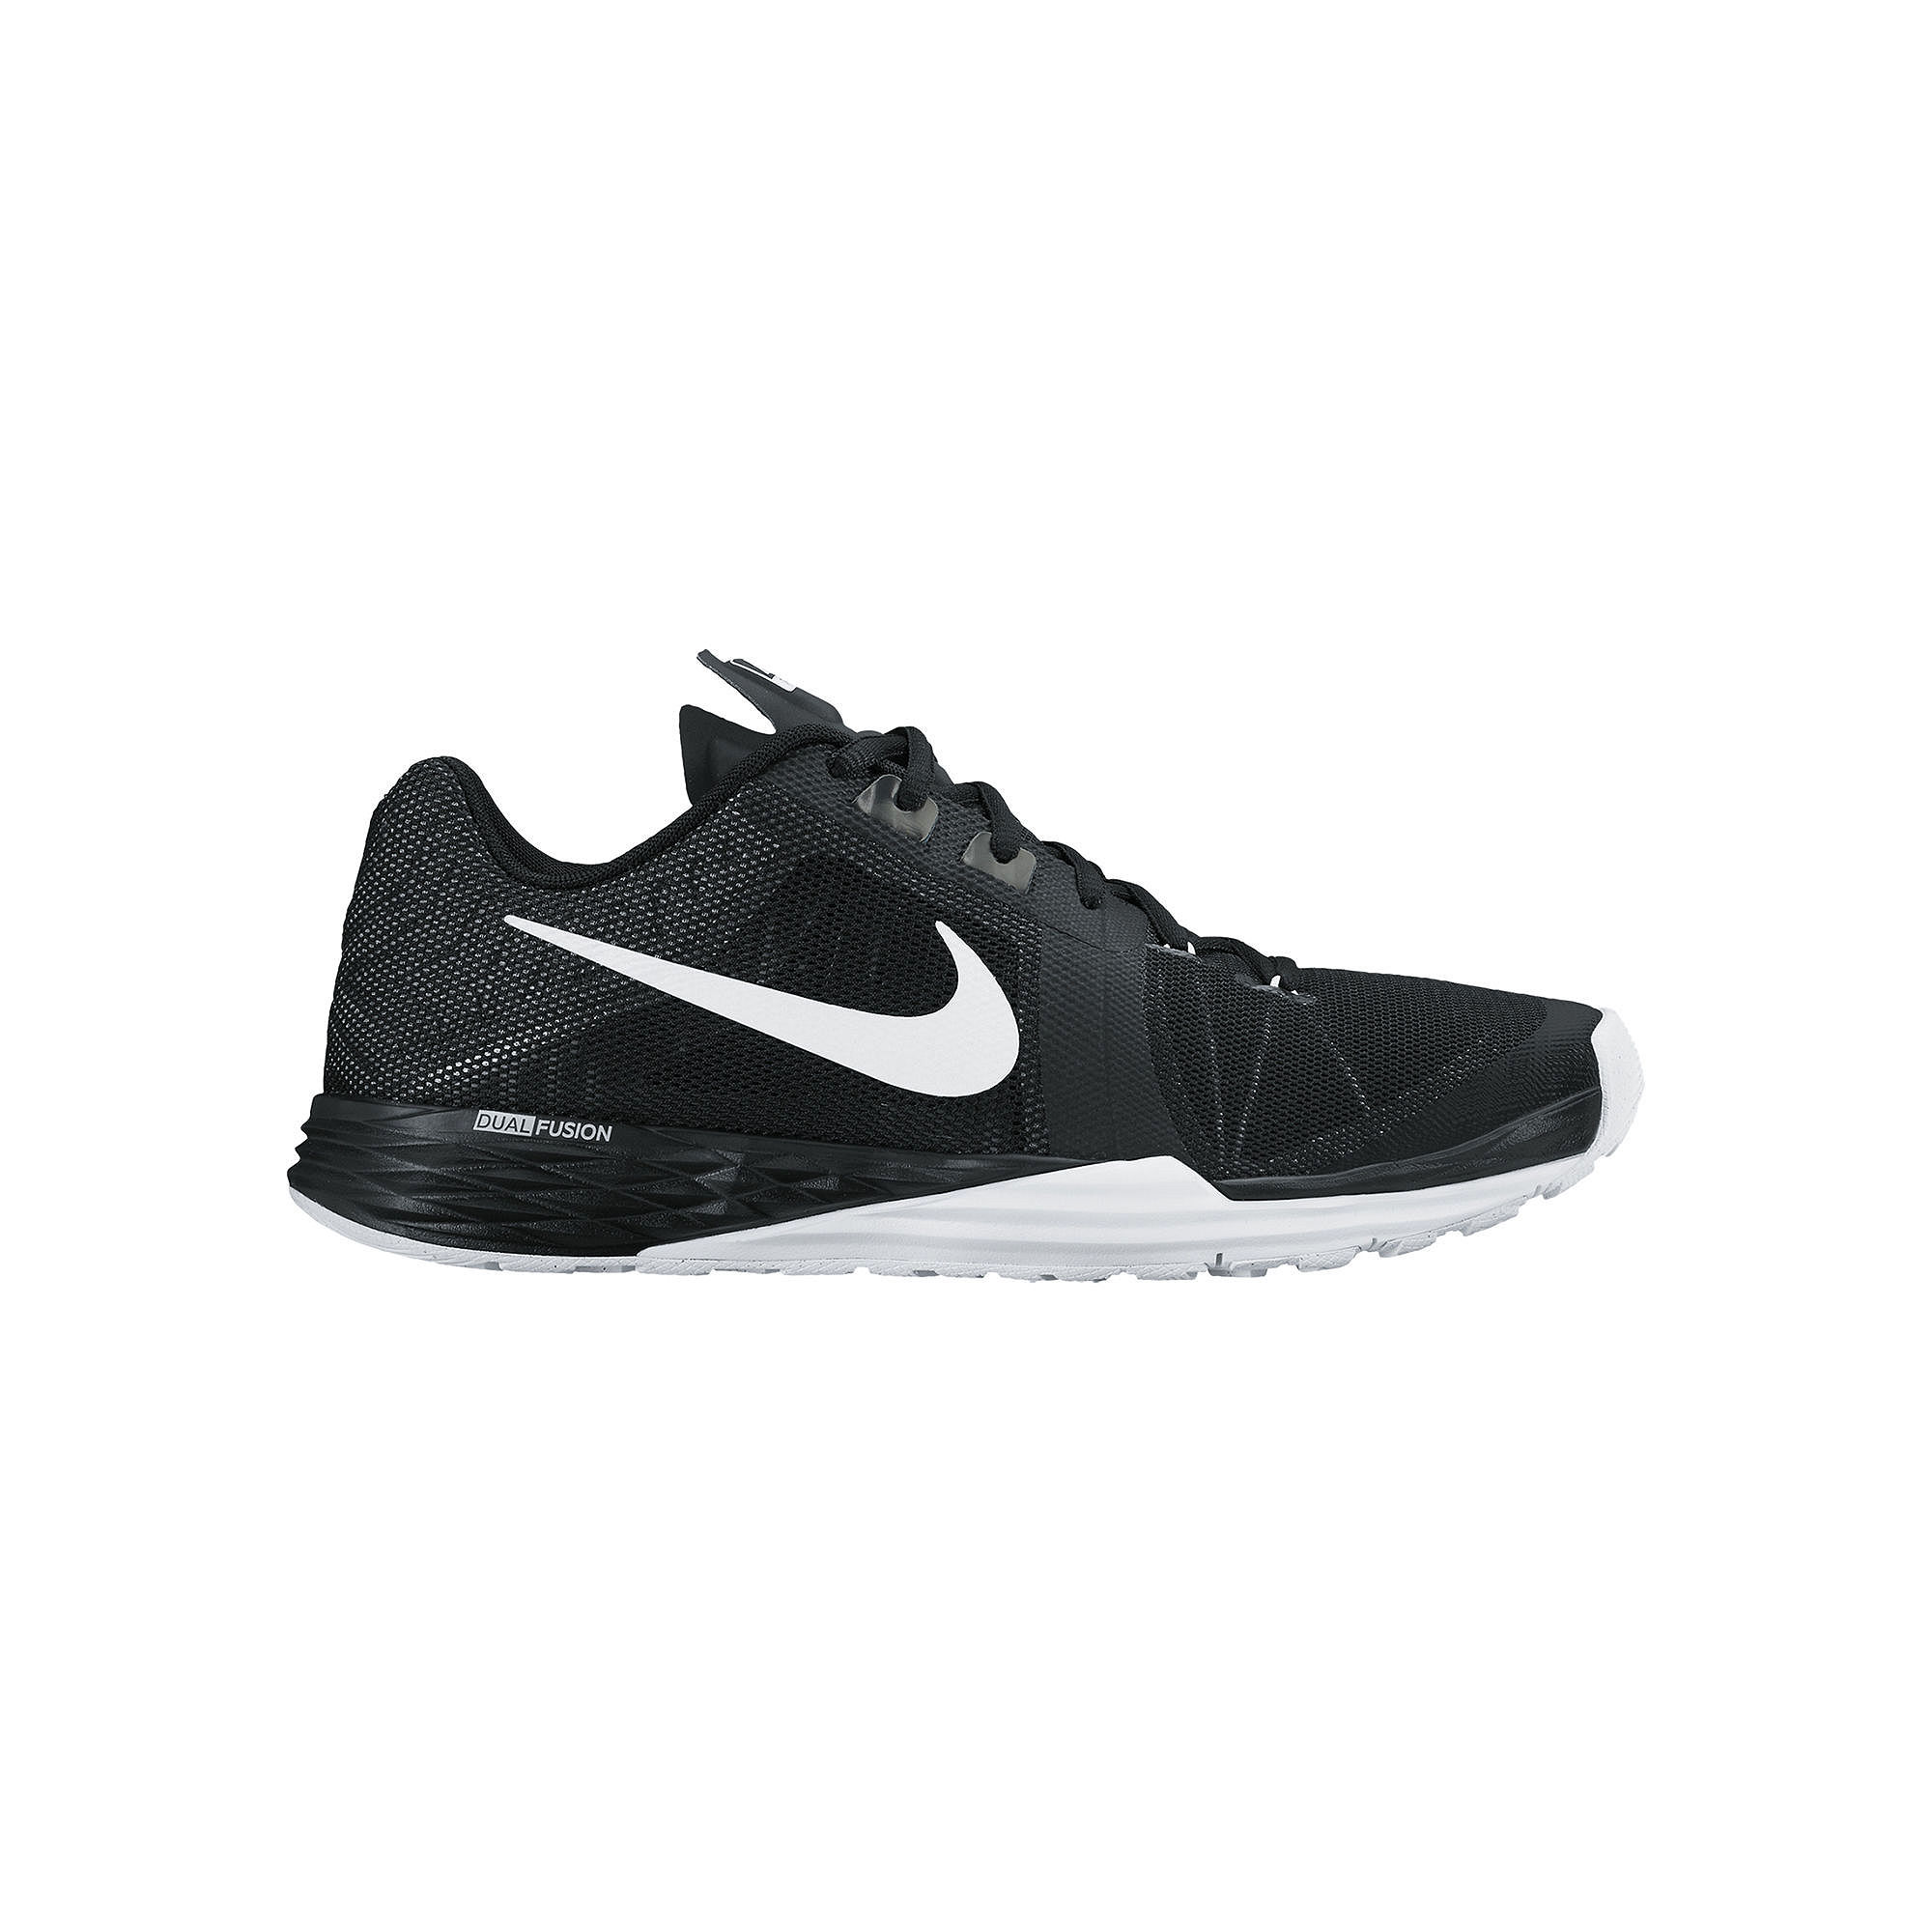 1 Mens Nike Train Prime Iron Dual Fusion Shoe 10.5 11.0 Blue 832219 404 Training